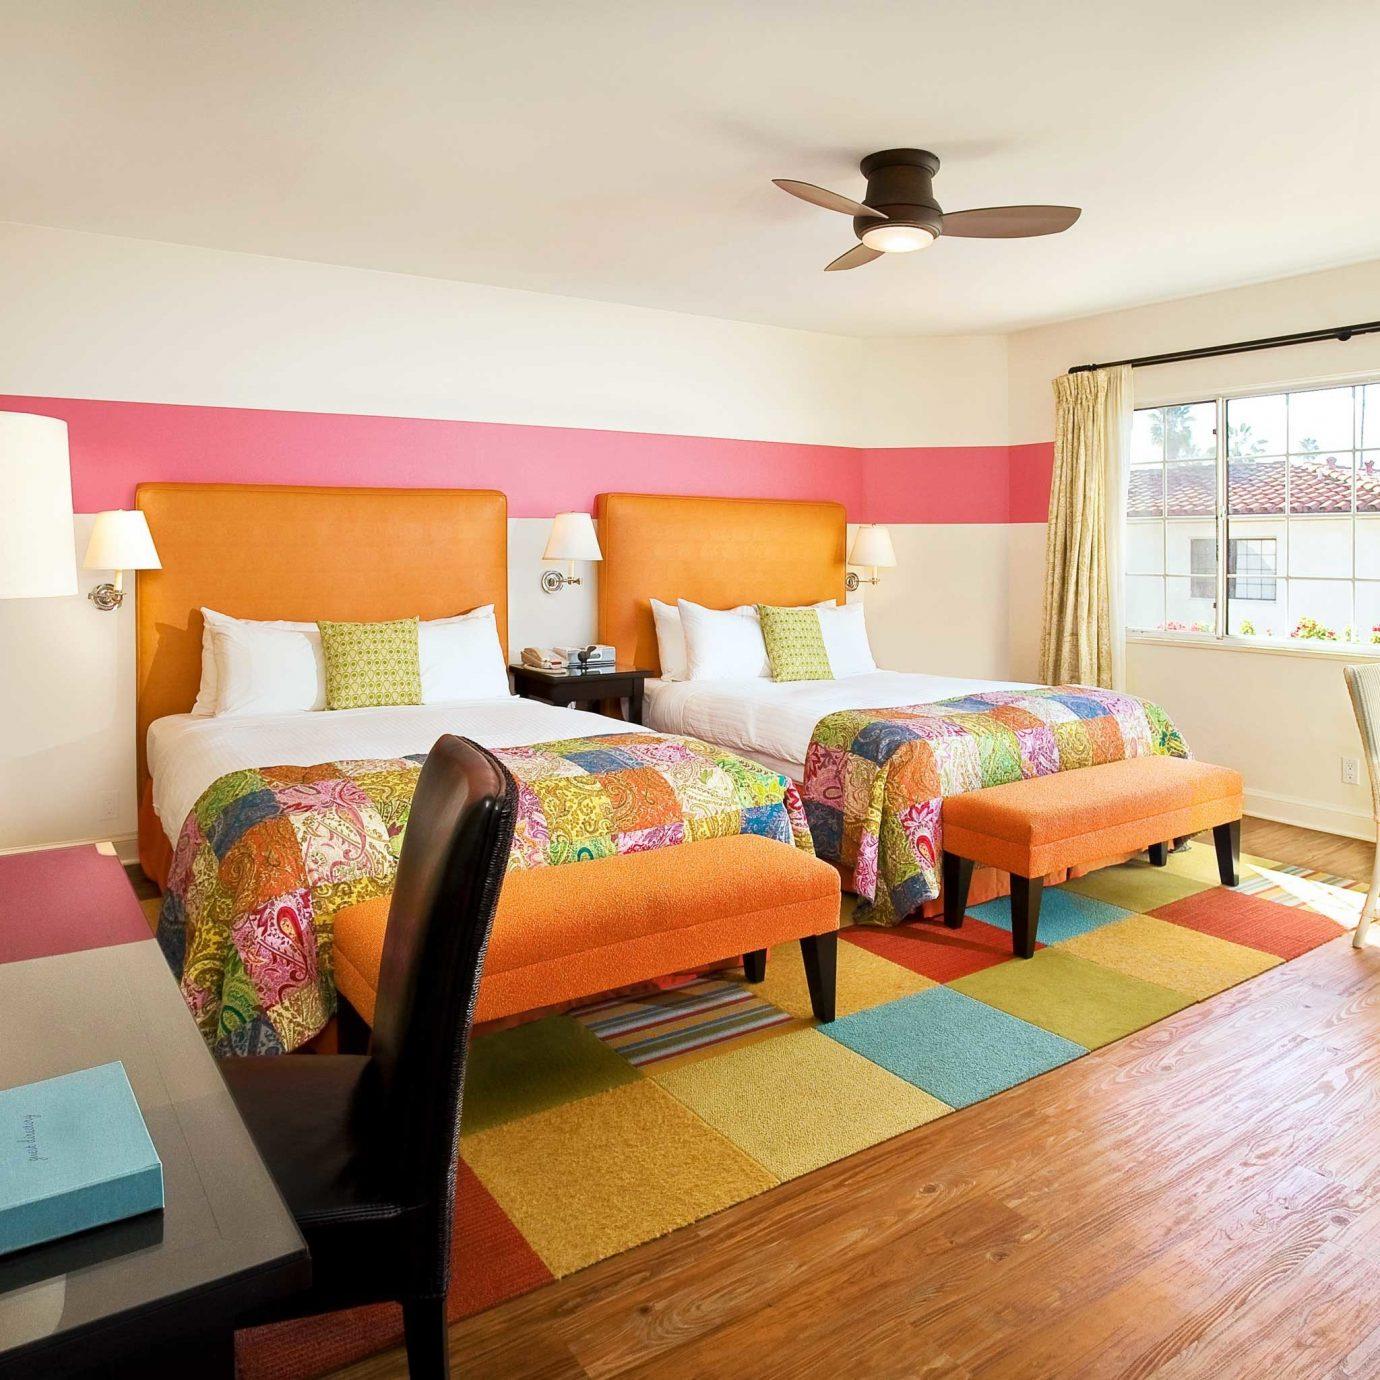 Balcony Bedroom Classic Country Luxury Scenic views Suite property living room home cottage condominium Villa